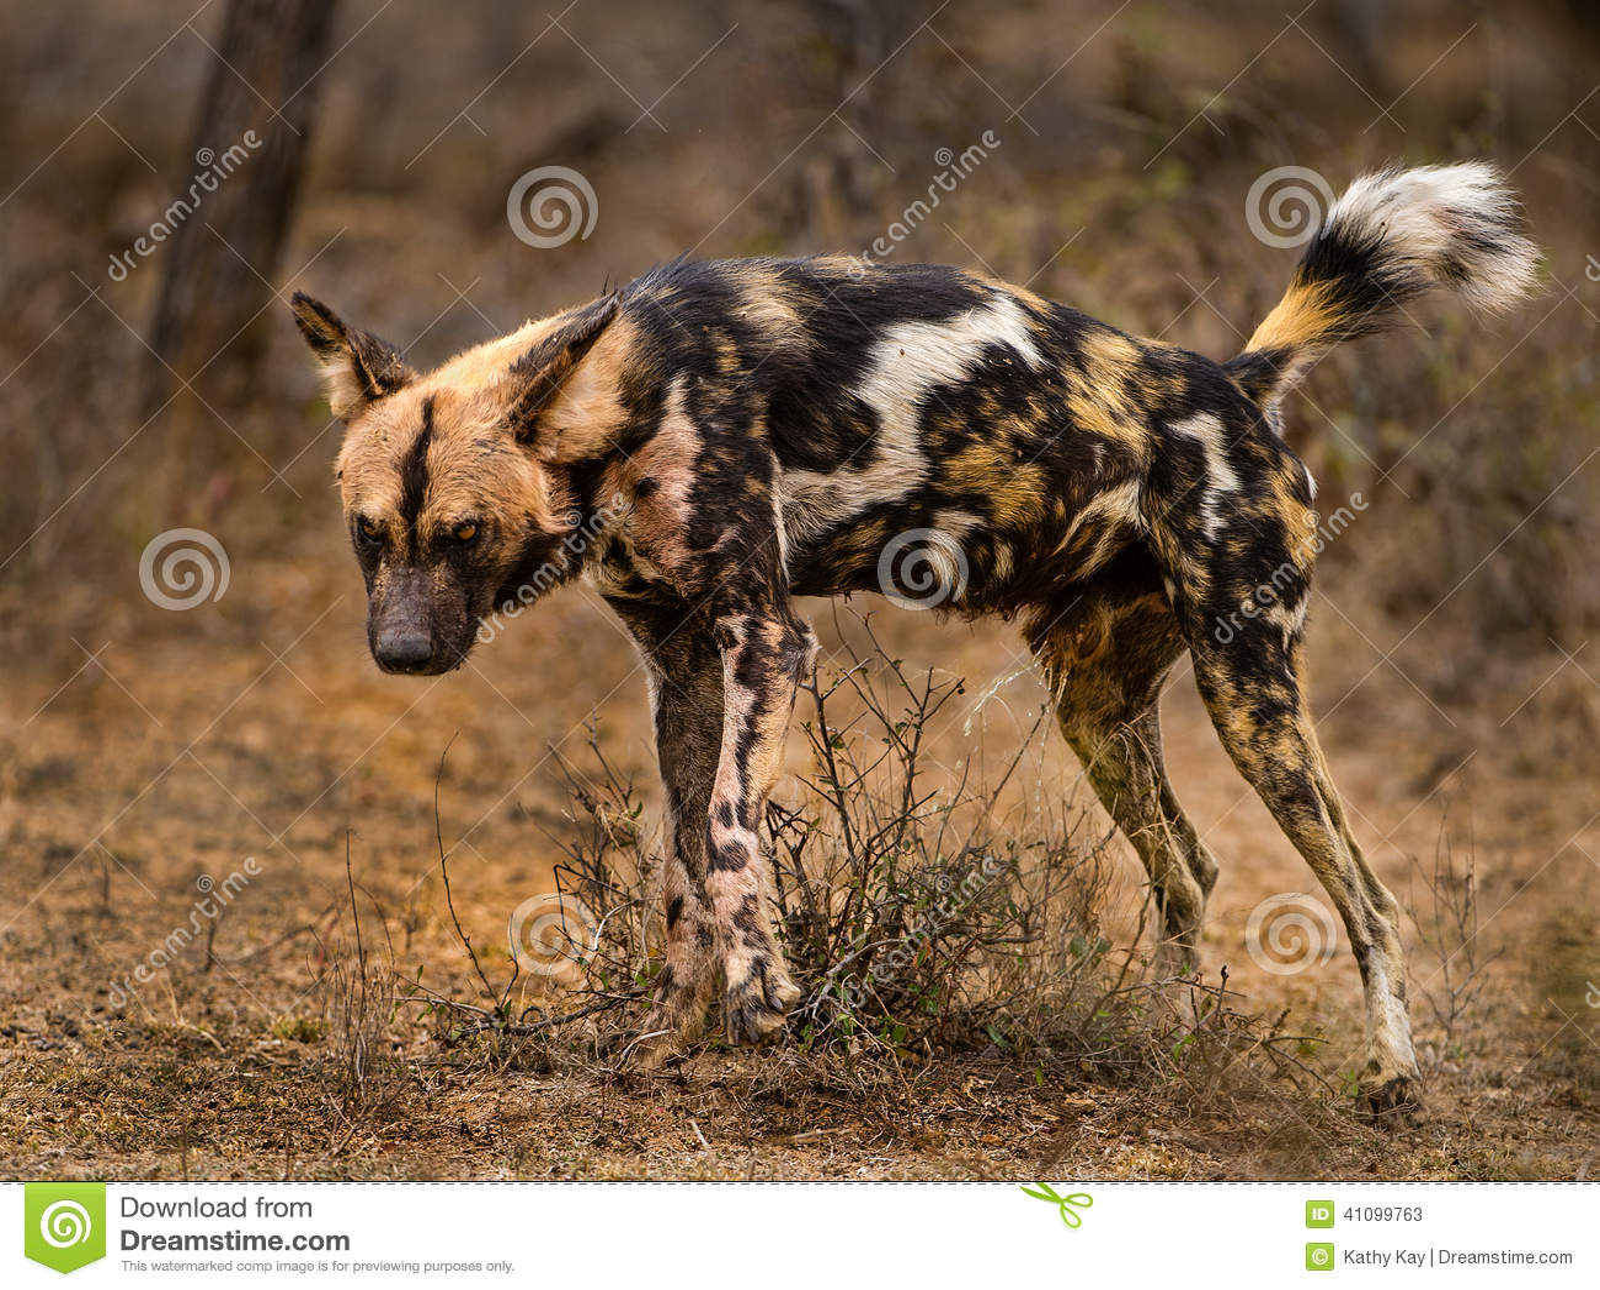 Good All Around Hunting Dog